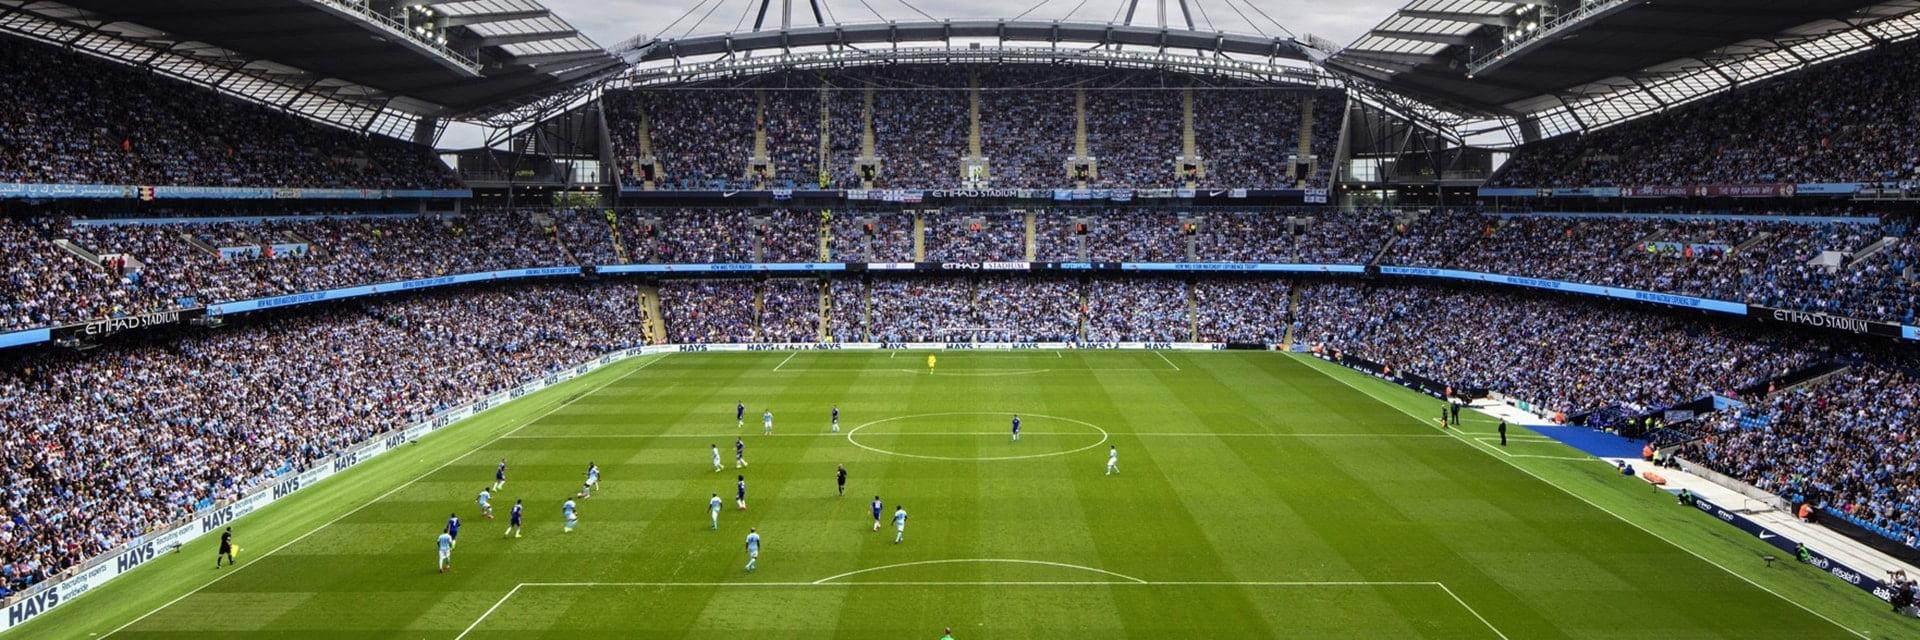 Manchester City - Southampton FC, 6 novemberden 15:00